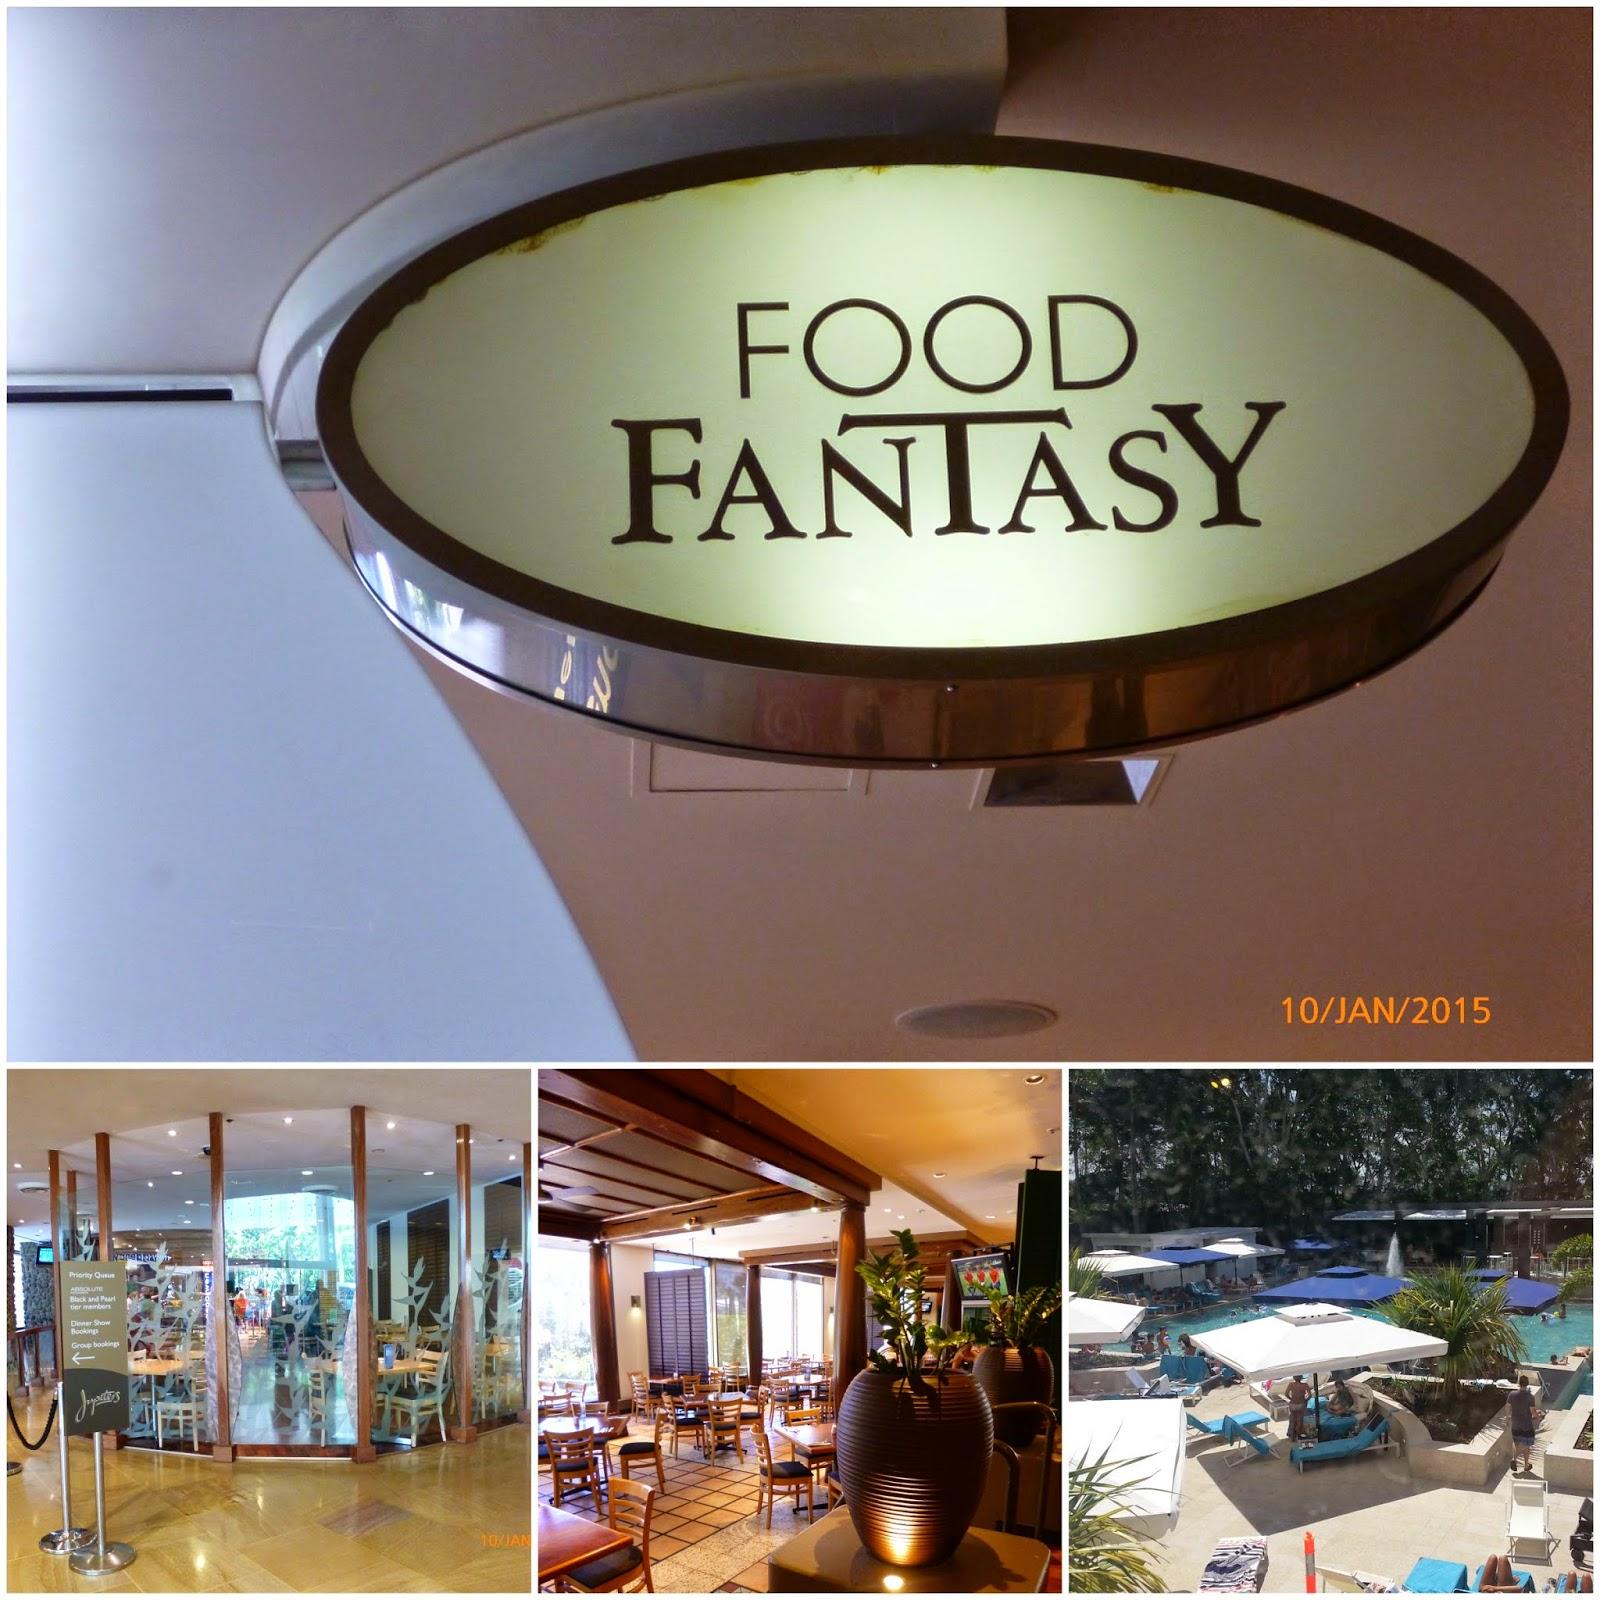 Food fantasy jupiters casino potawatomi casino milwaukee bingo